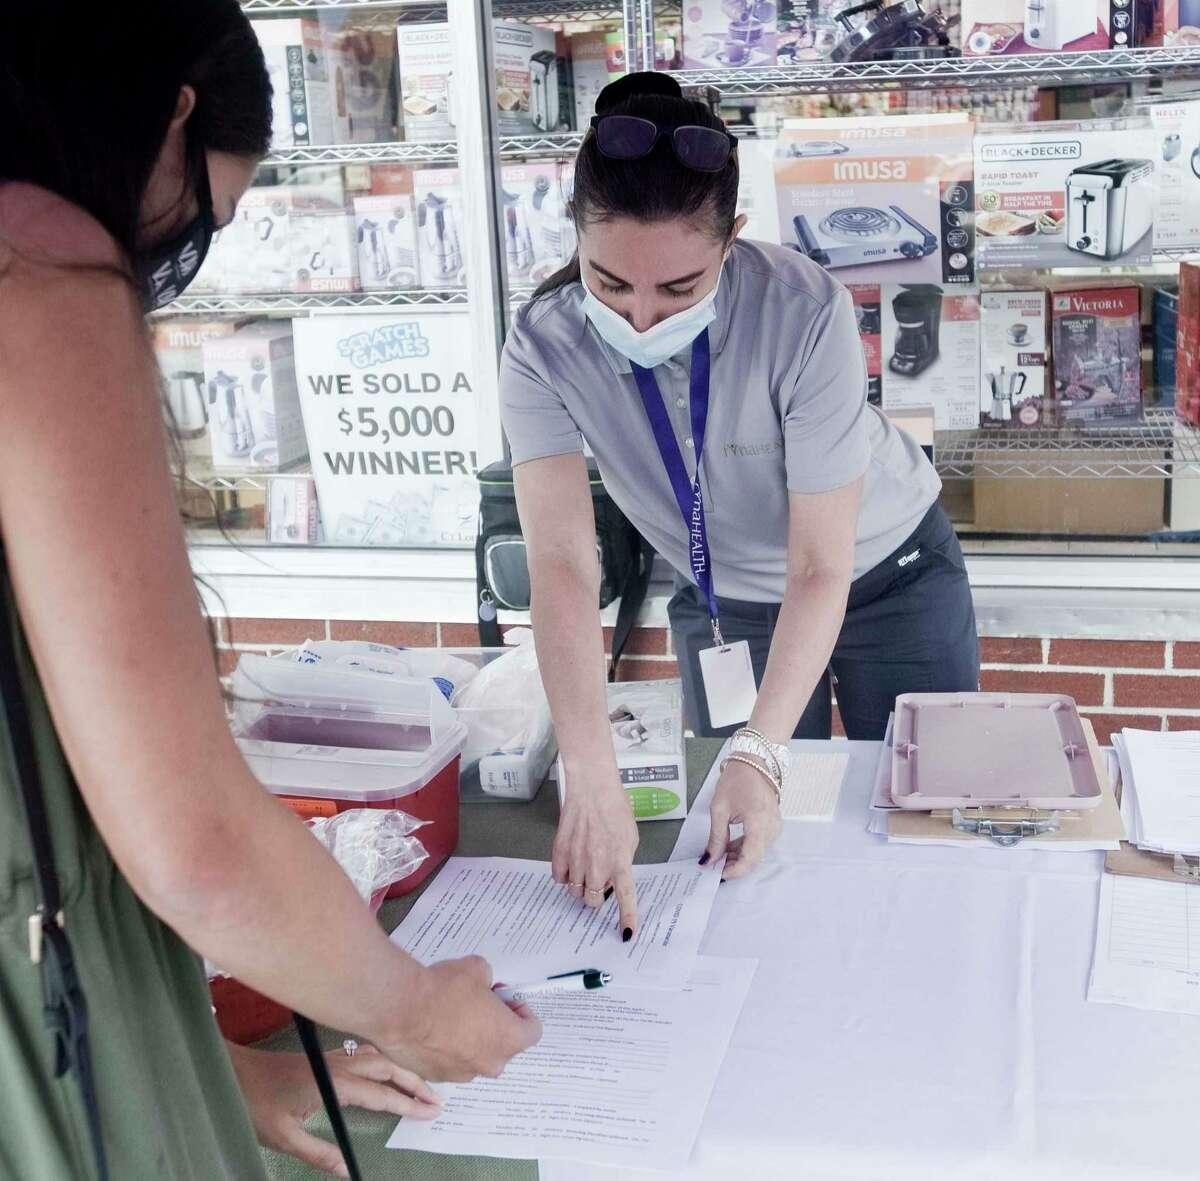 Fernanda Araujo, a nurse with the Ridgefield Visiting Nurse Association, explains COVID-19 vaccine information at CTown Supermarket in Danbury. Tuesday, June 22, 2021